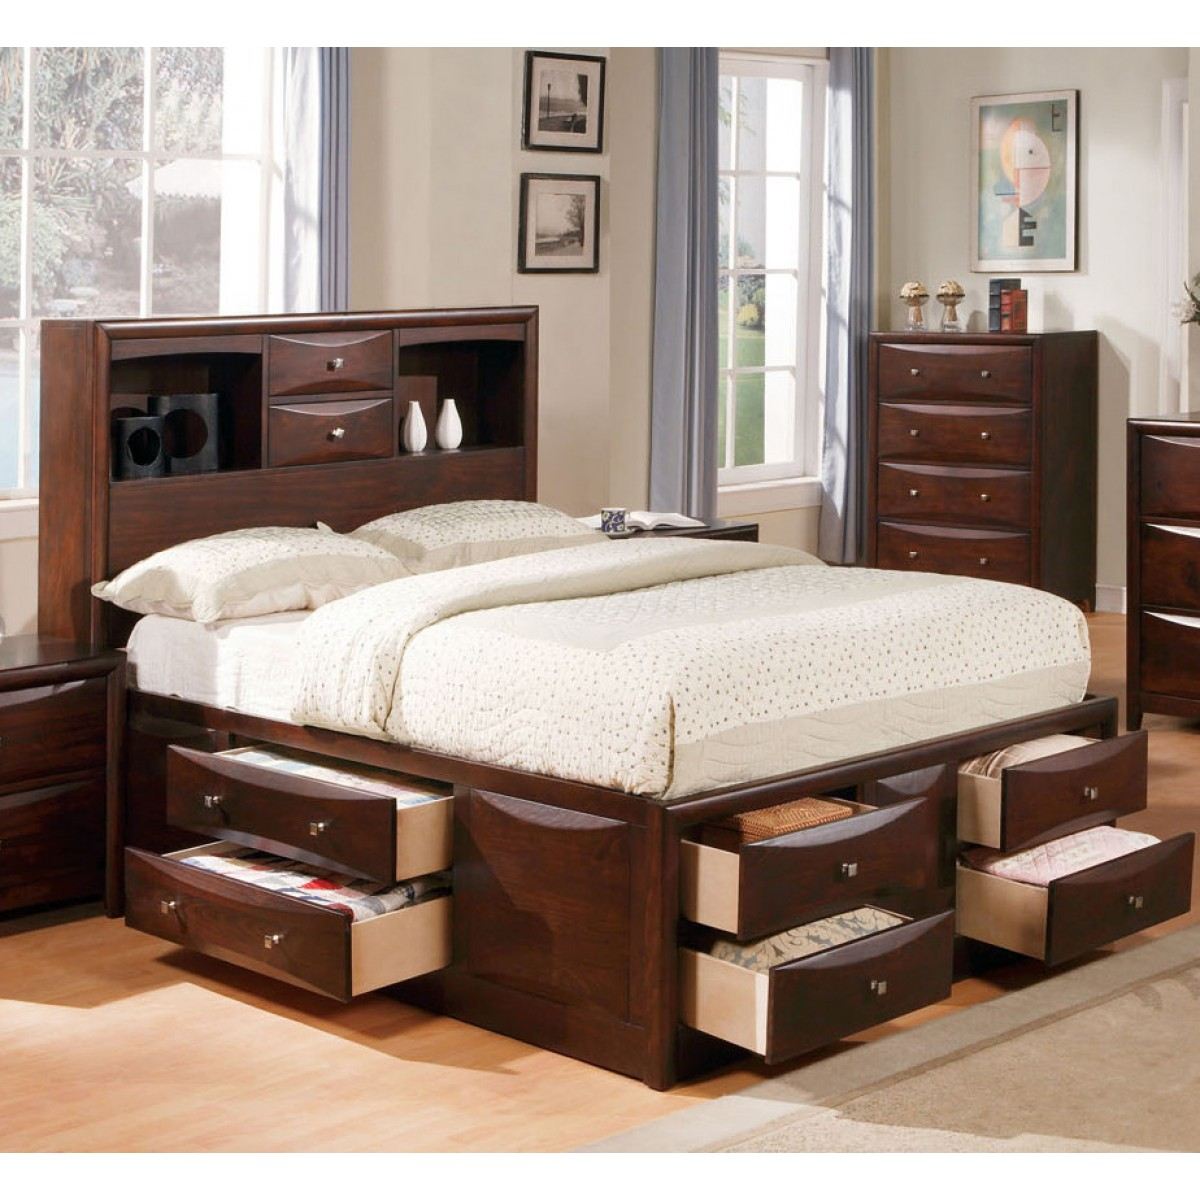 Manhattan Espresso Full Bed W/Storage. By Acme Furniture